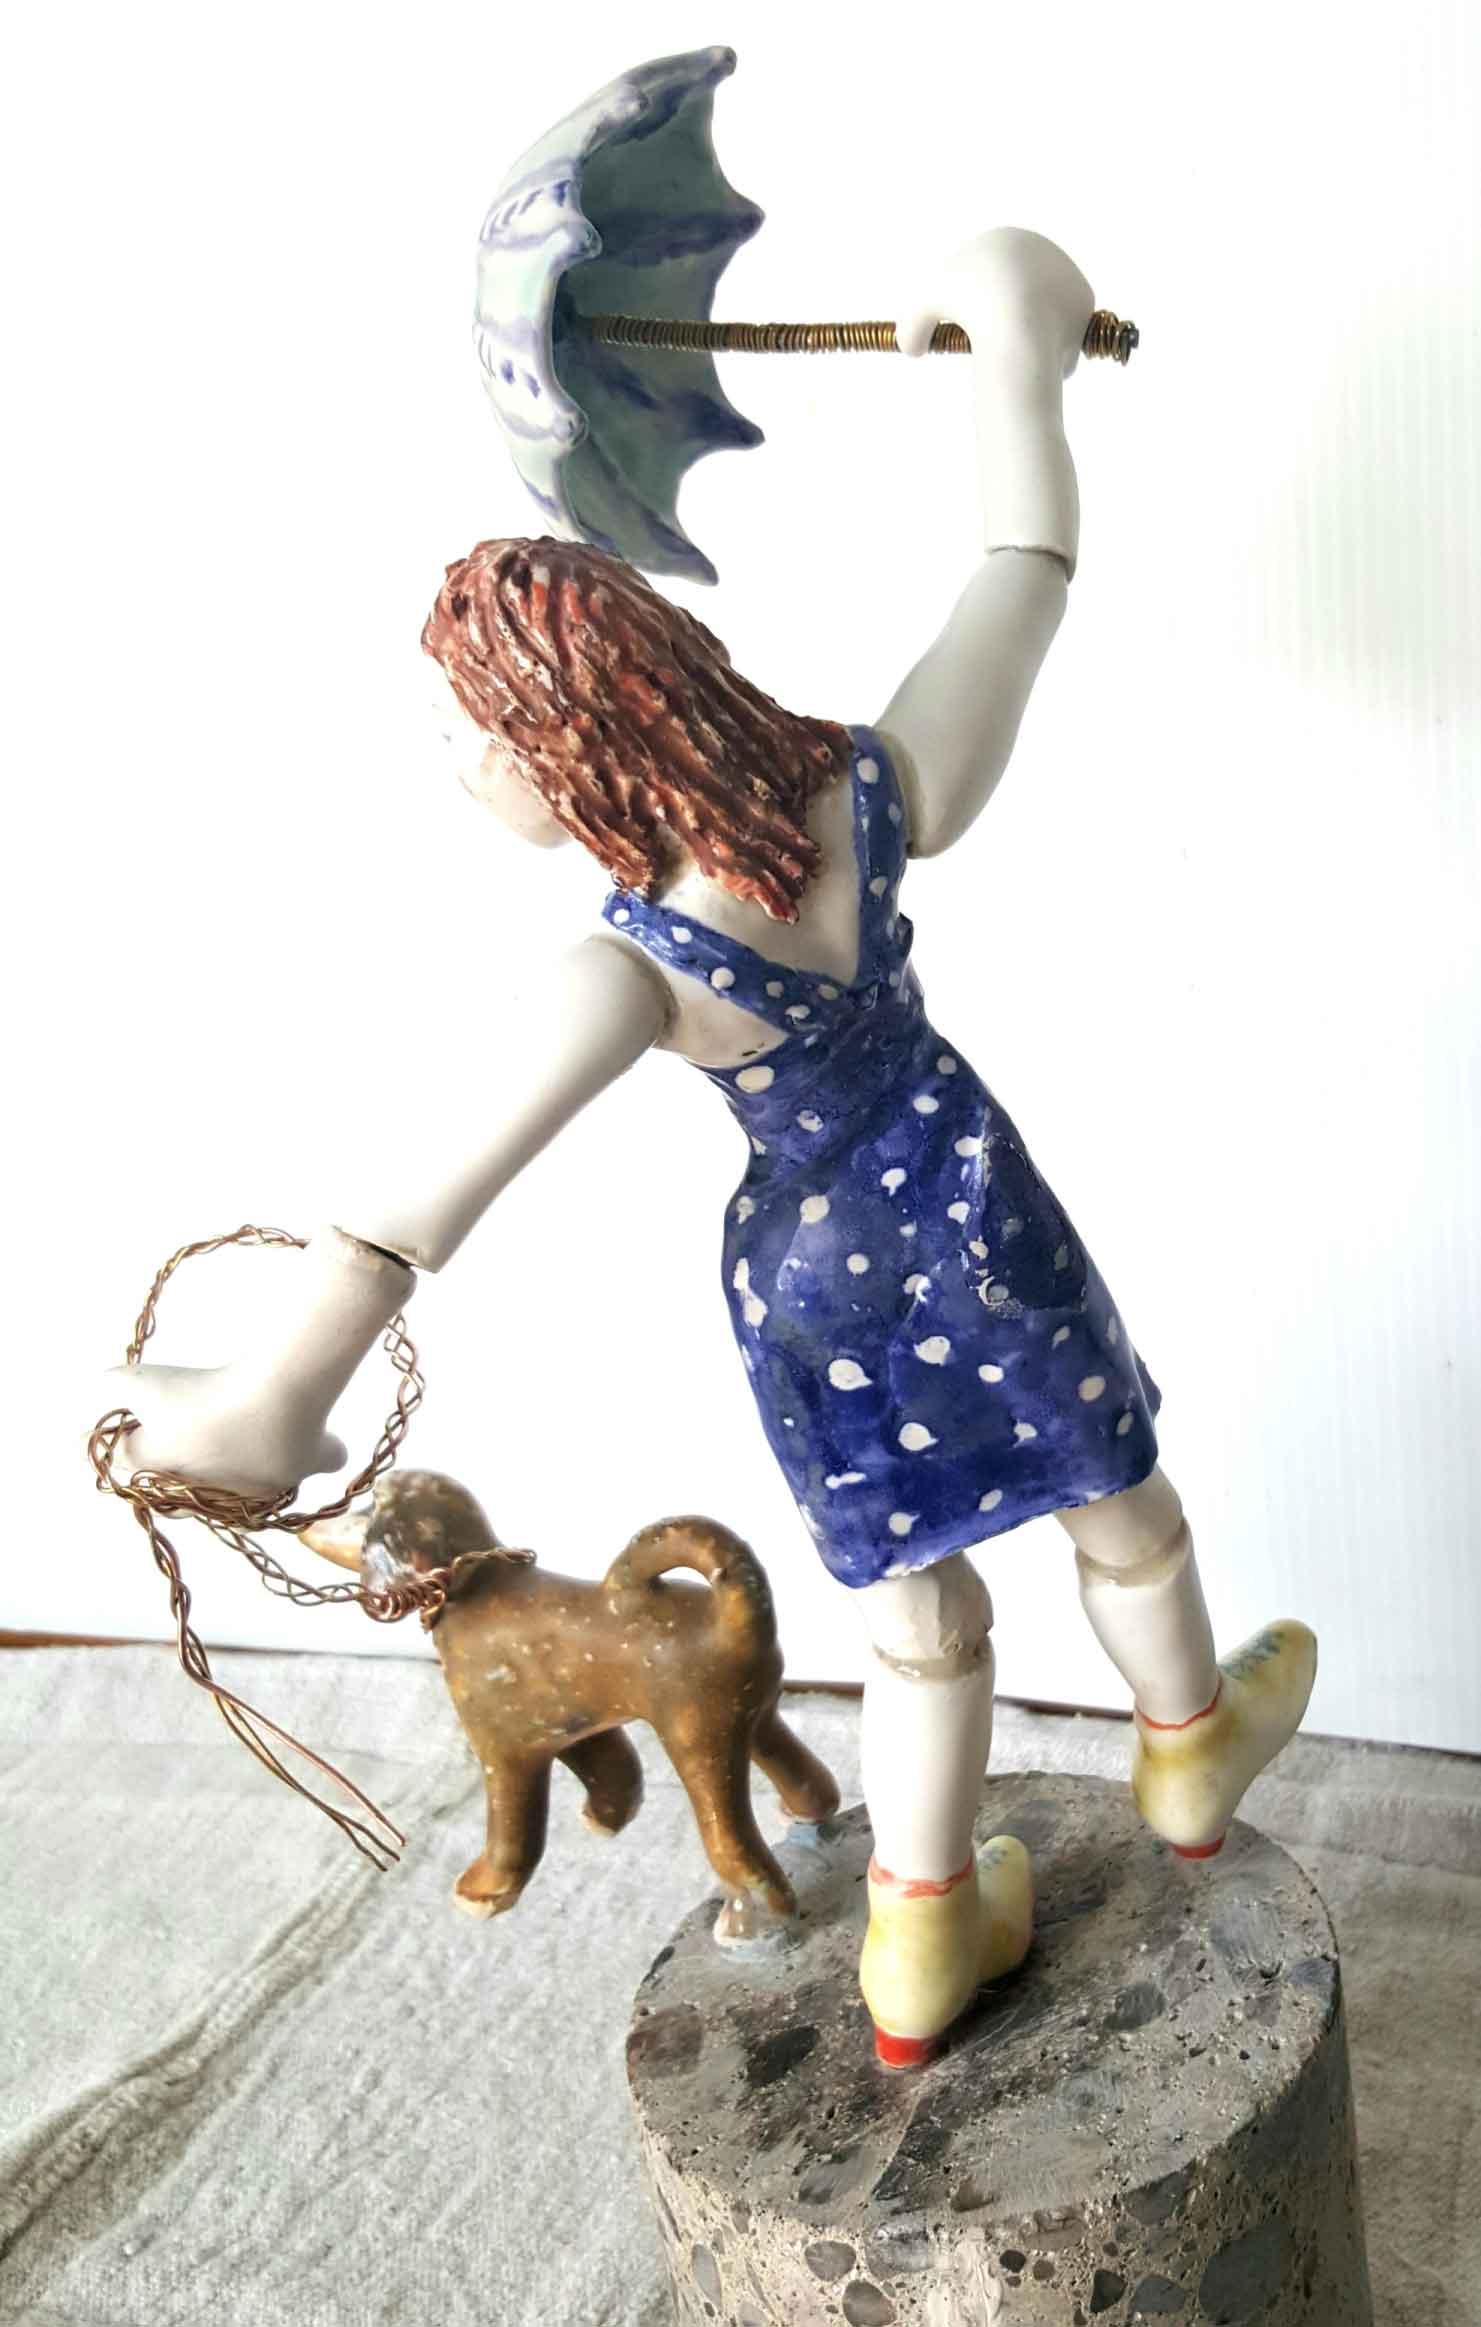 Porcelain sculpture of a woman walking a dog by Saundra Reiner